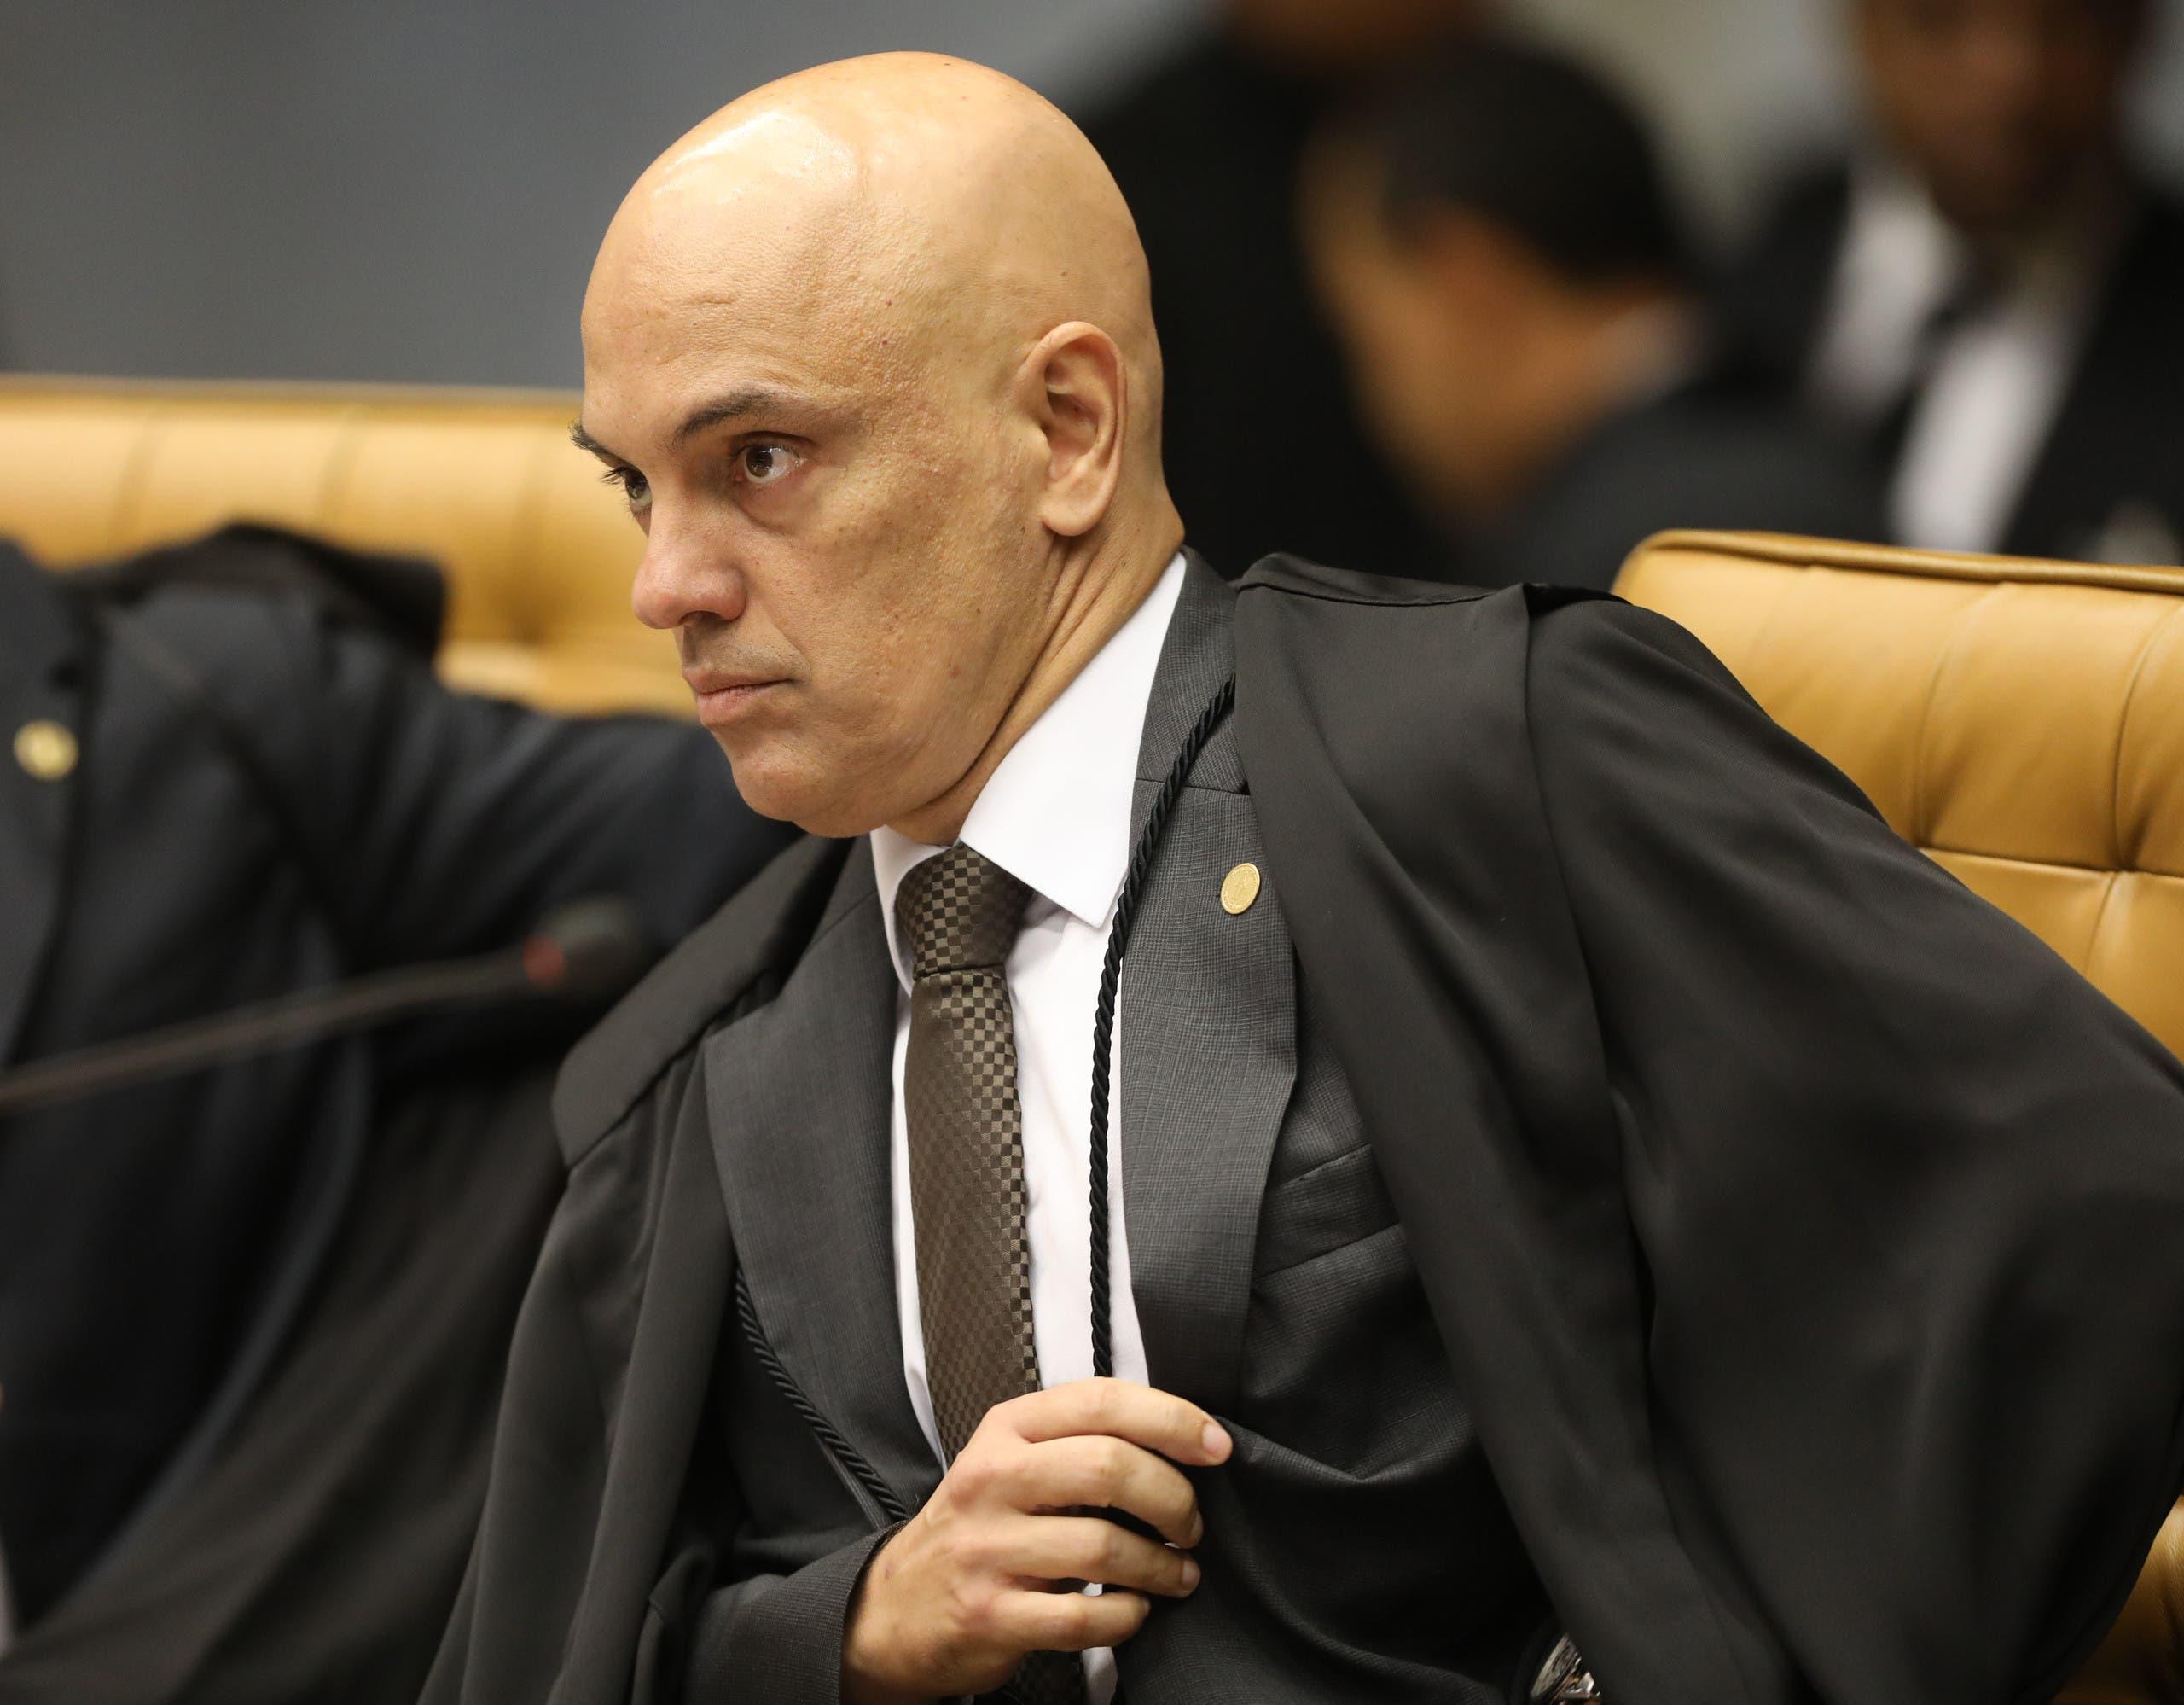 القاضي ألكسندر دي مورايس